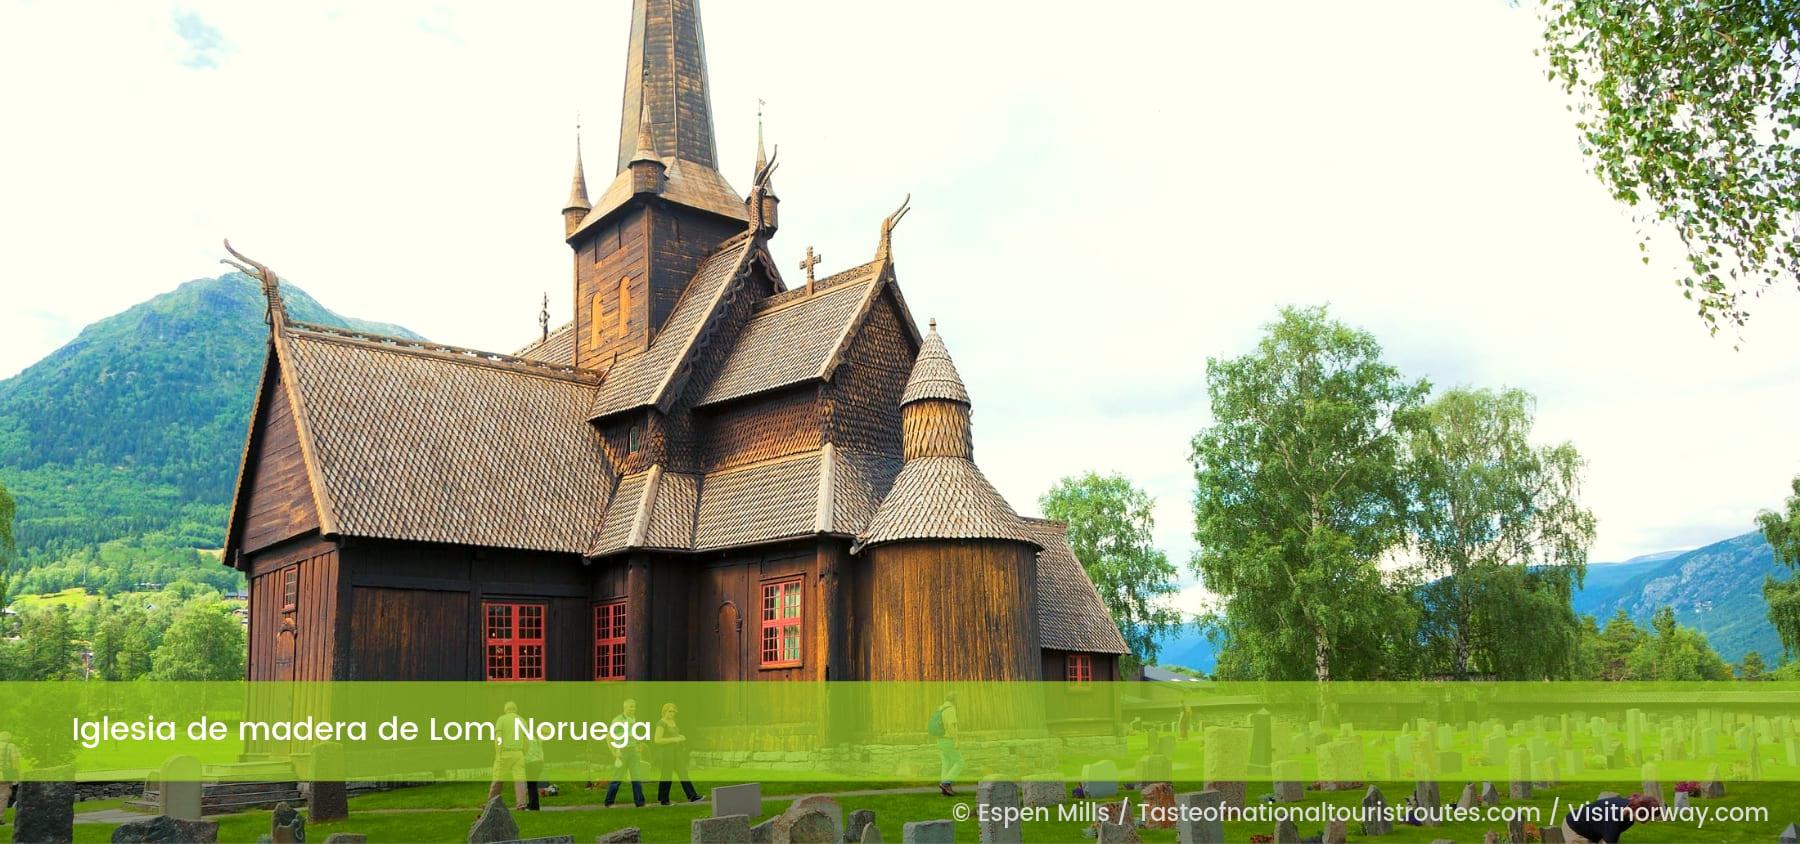 Iglesia de madera de Lom Noruega